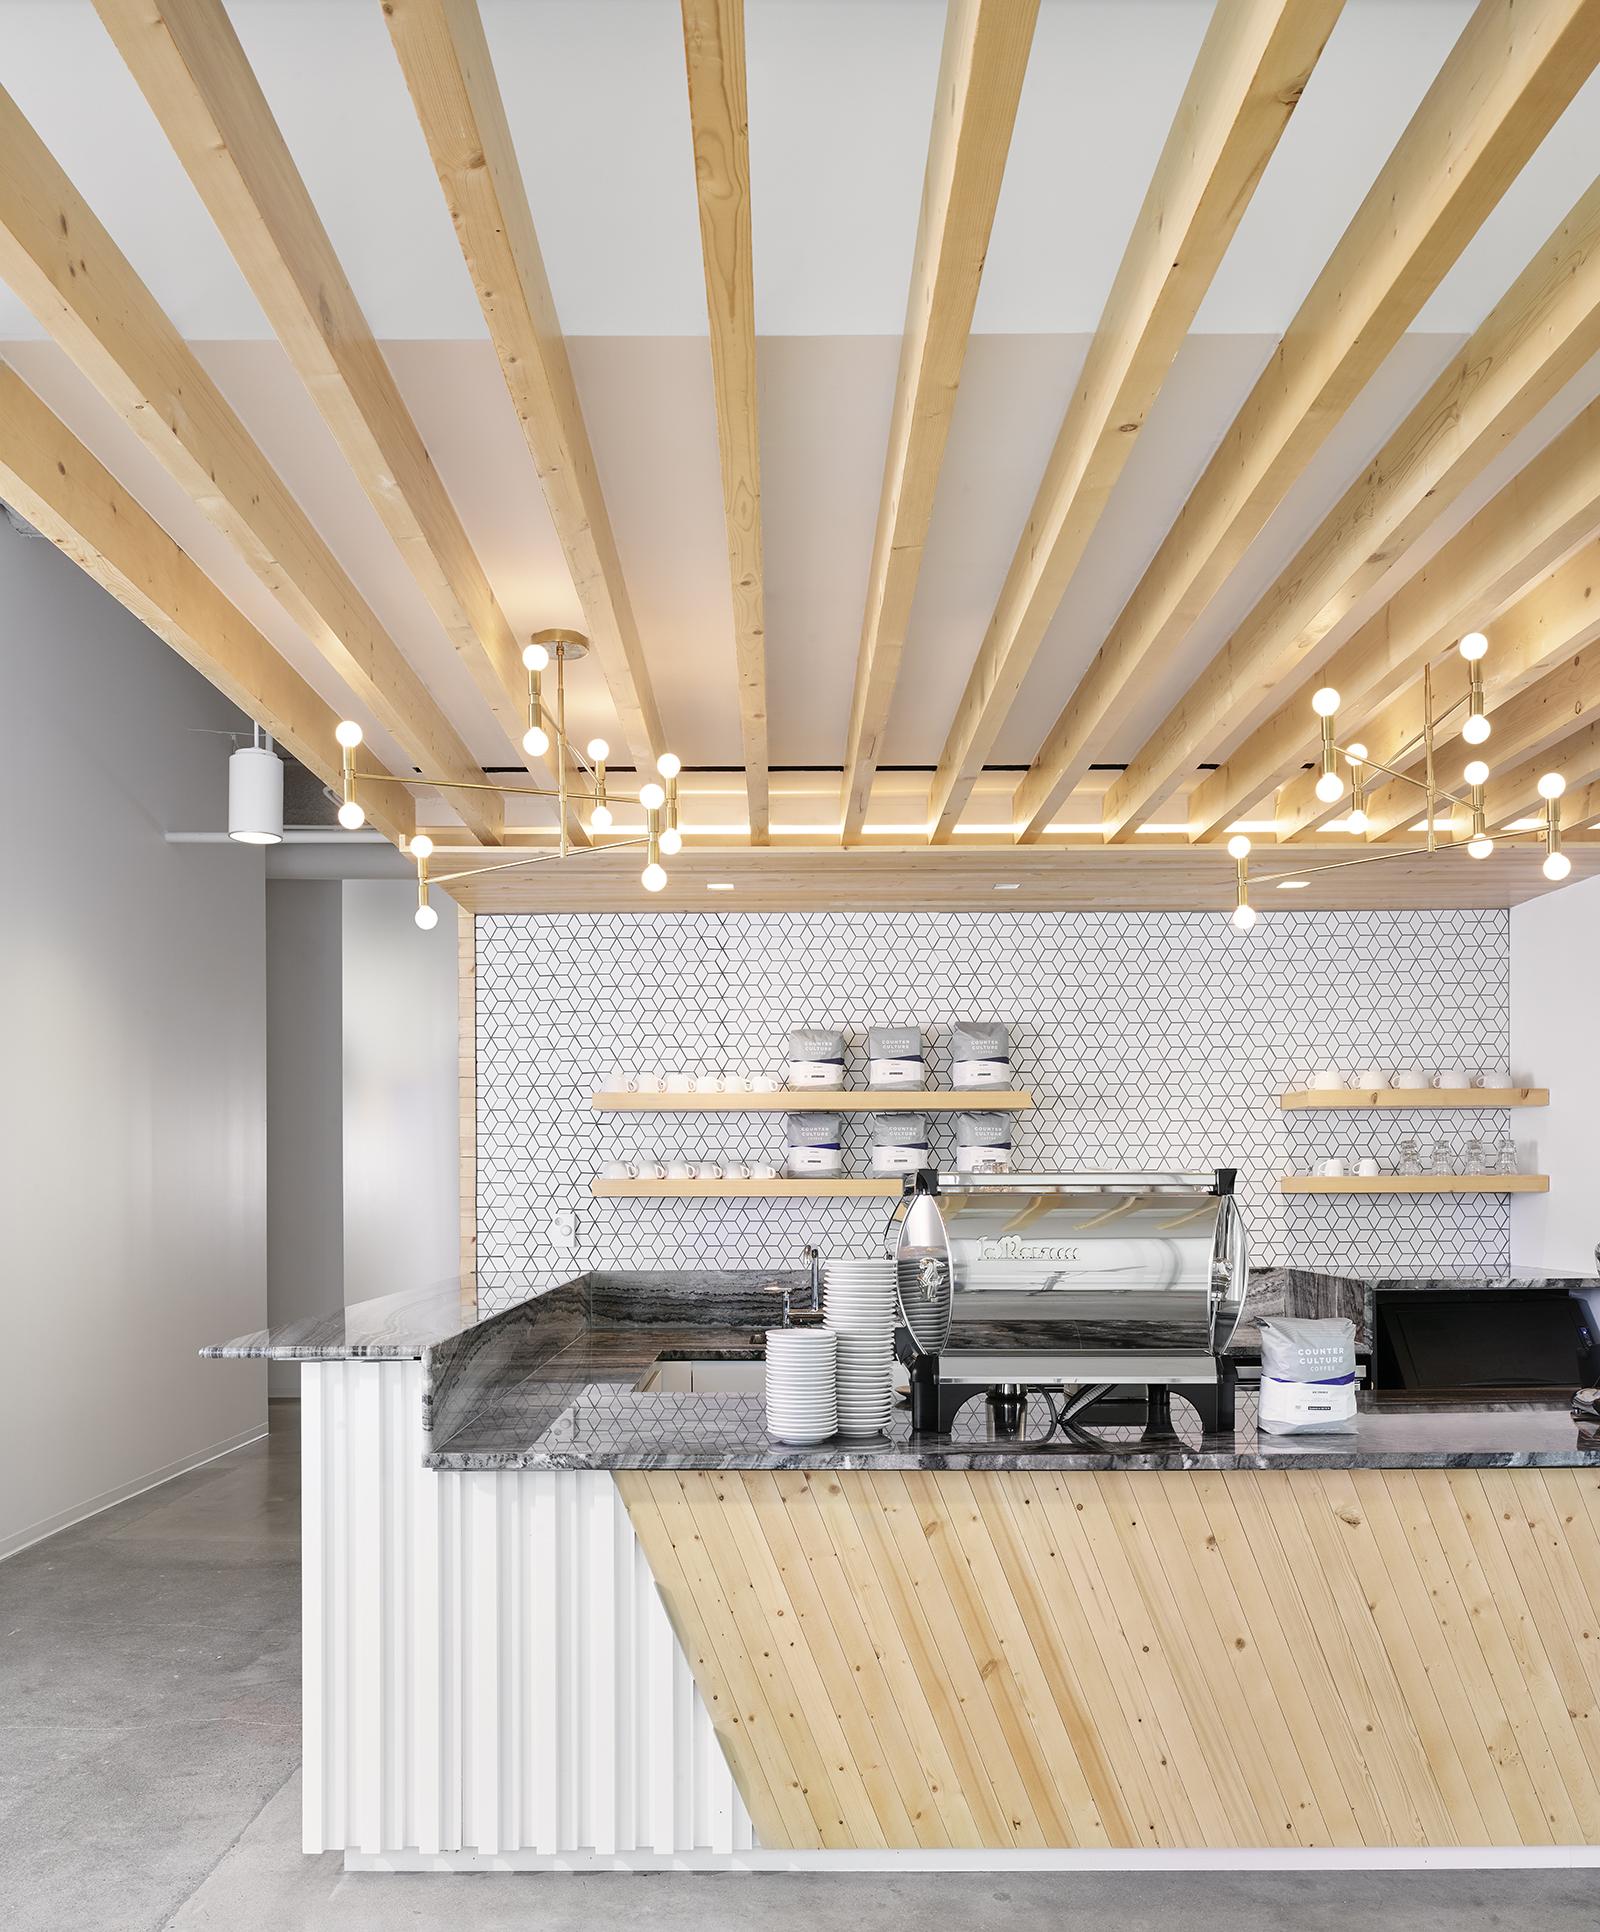 dropbox seattle office mt. cafe cafe277087 dropbox seattle office mt